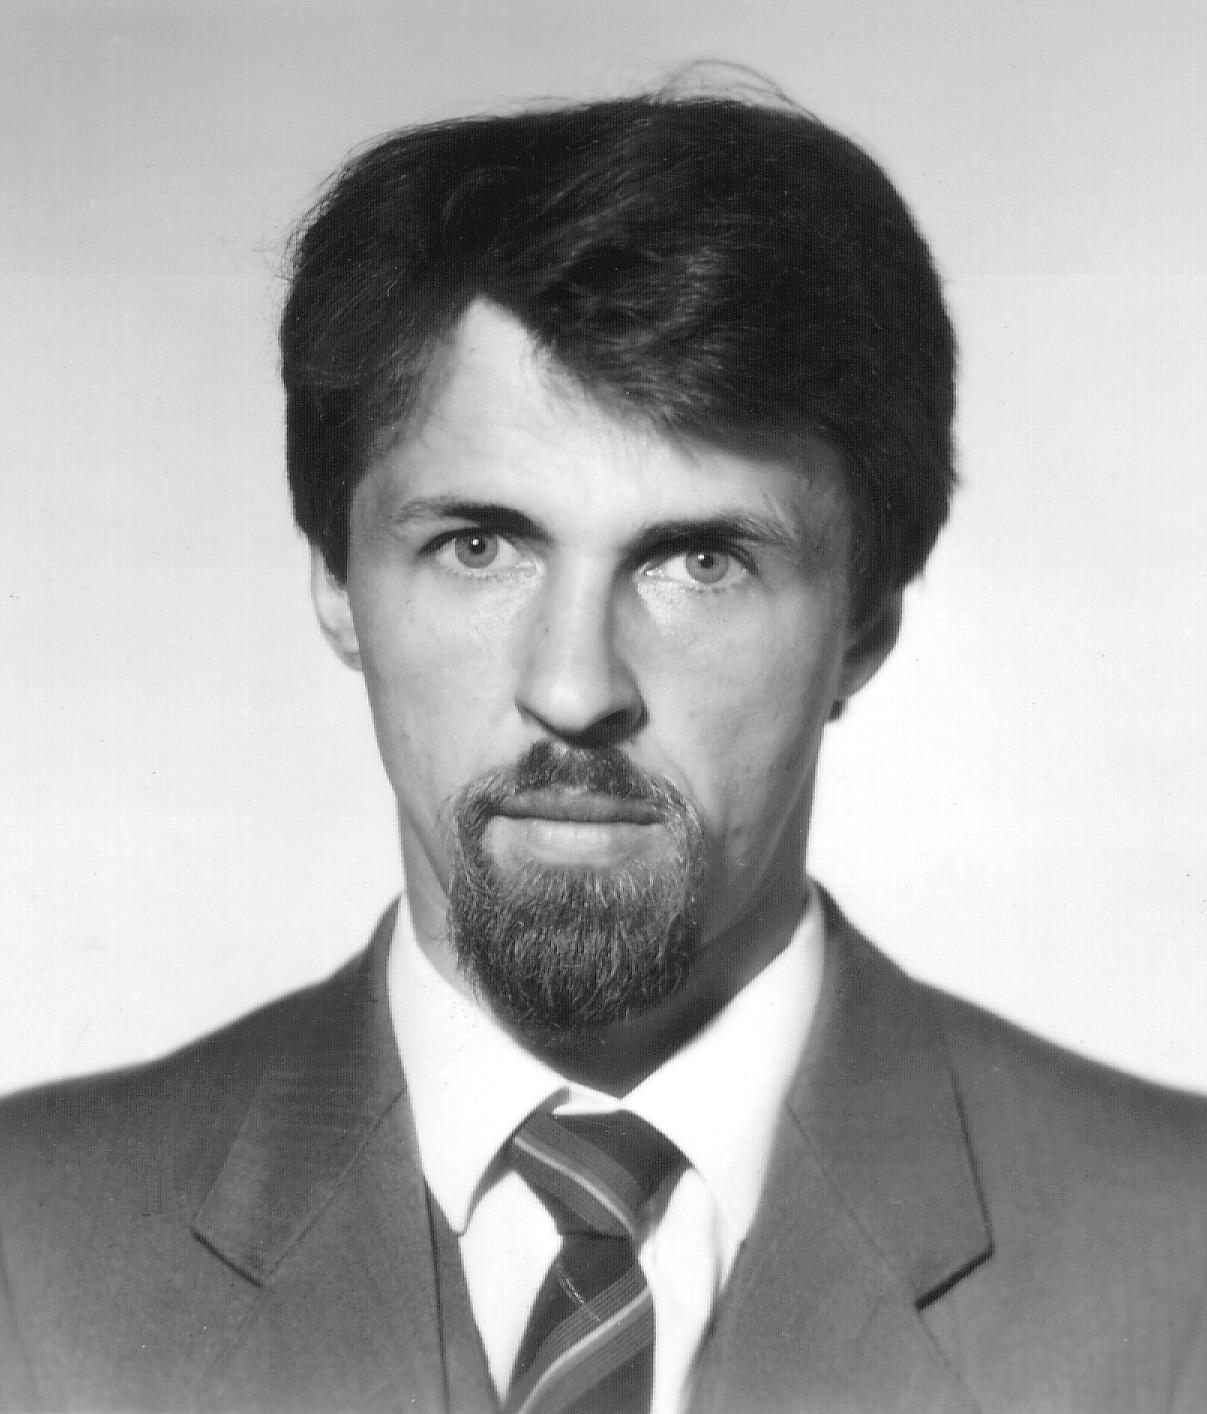 Васильев александр юрьевич 2 фотография